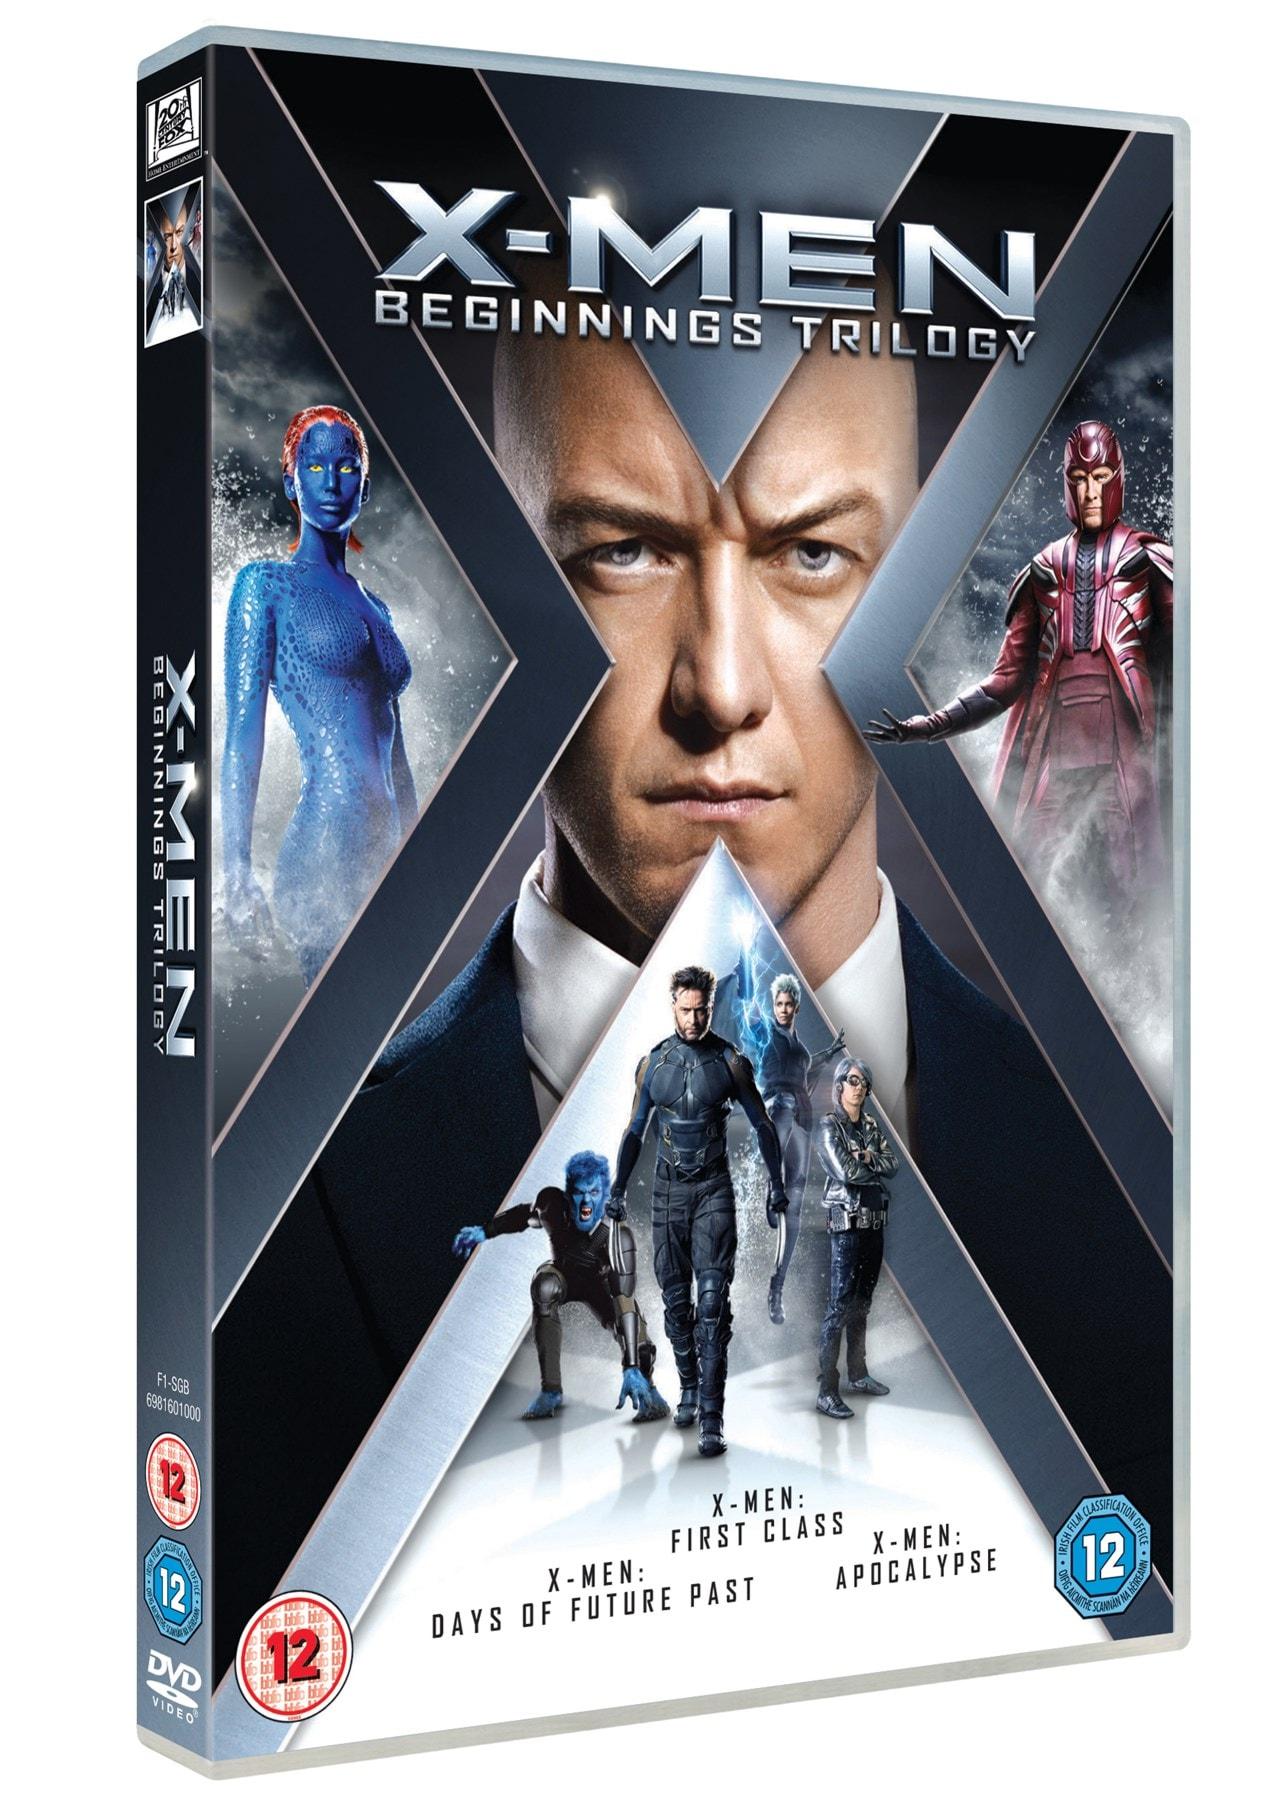 X-men: Beginnings Trilogy - 2